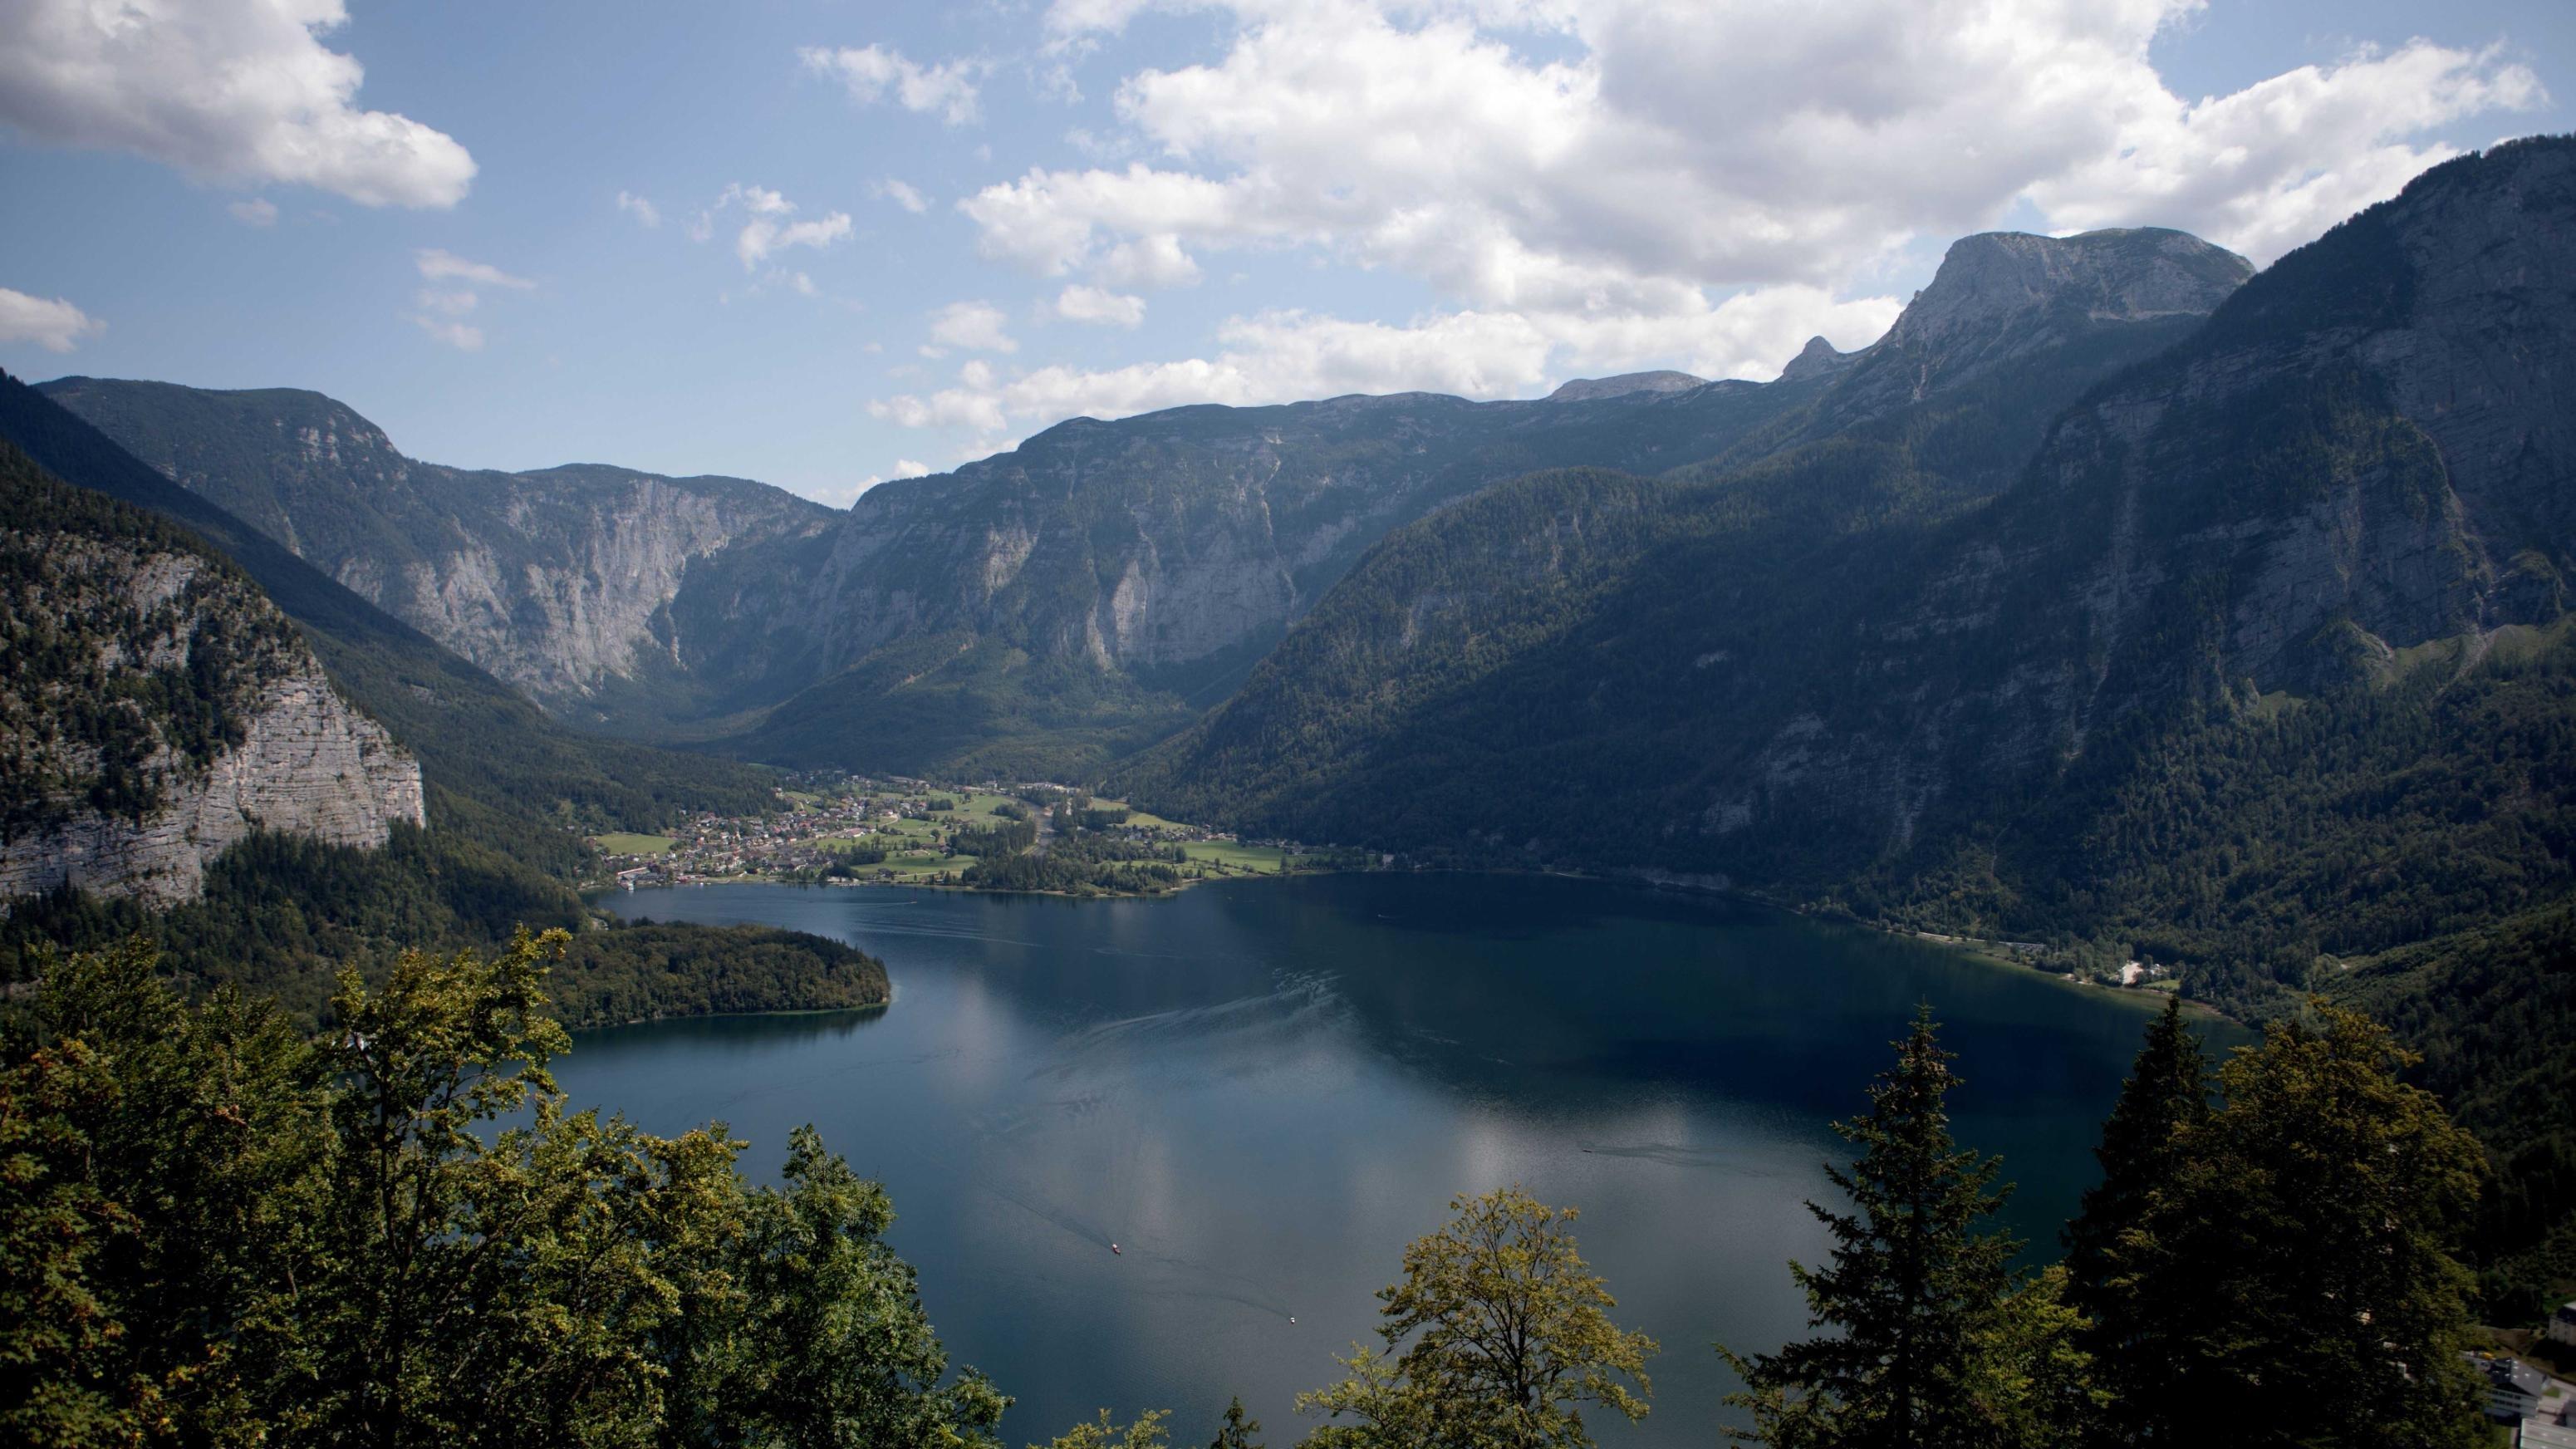 Picture of Hallstatt